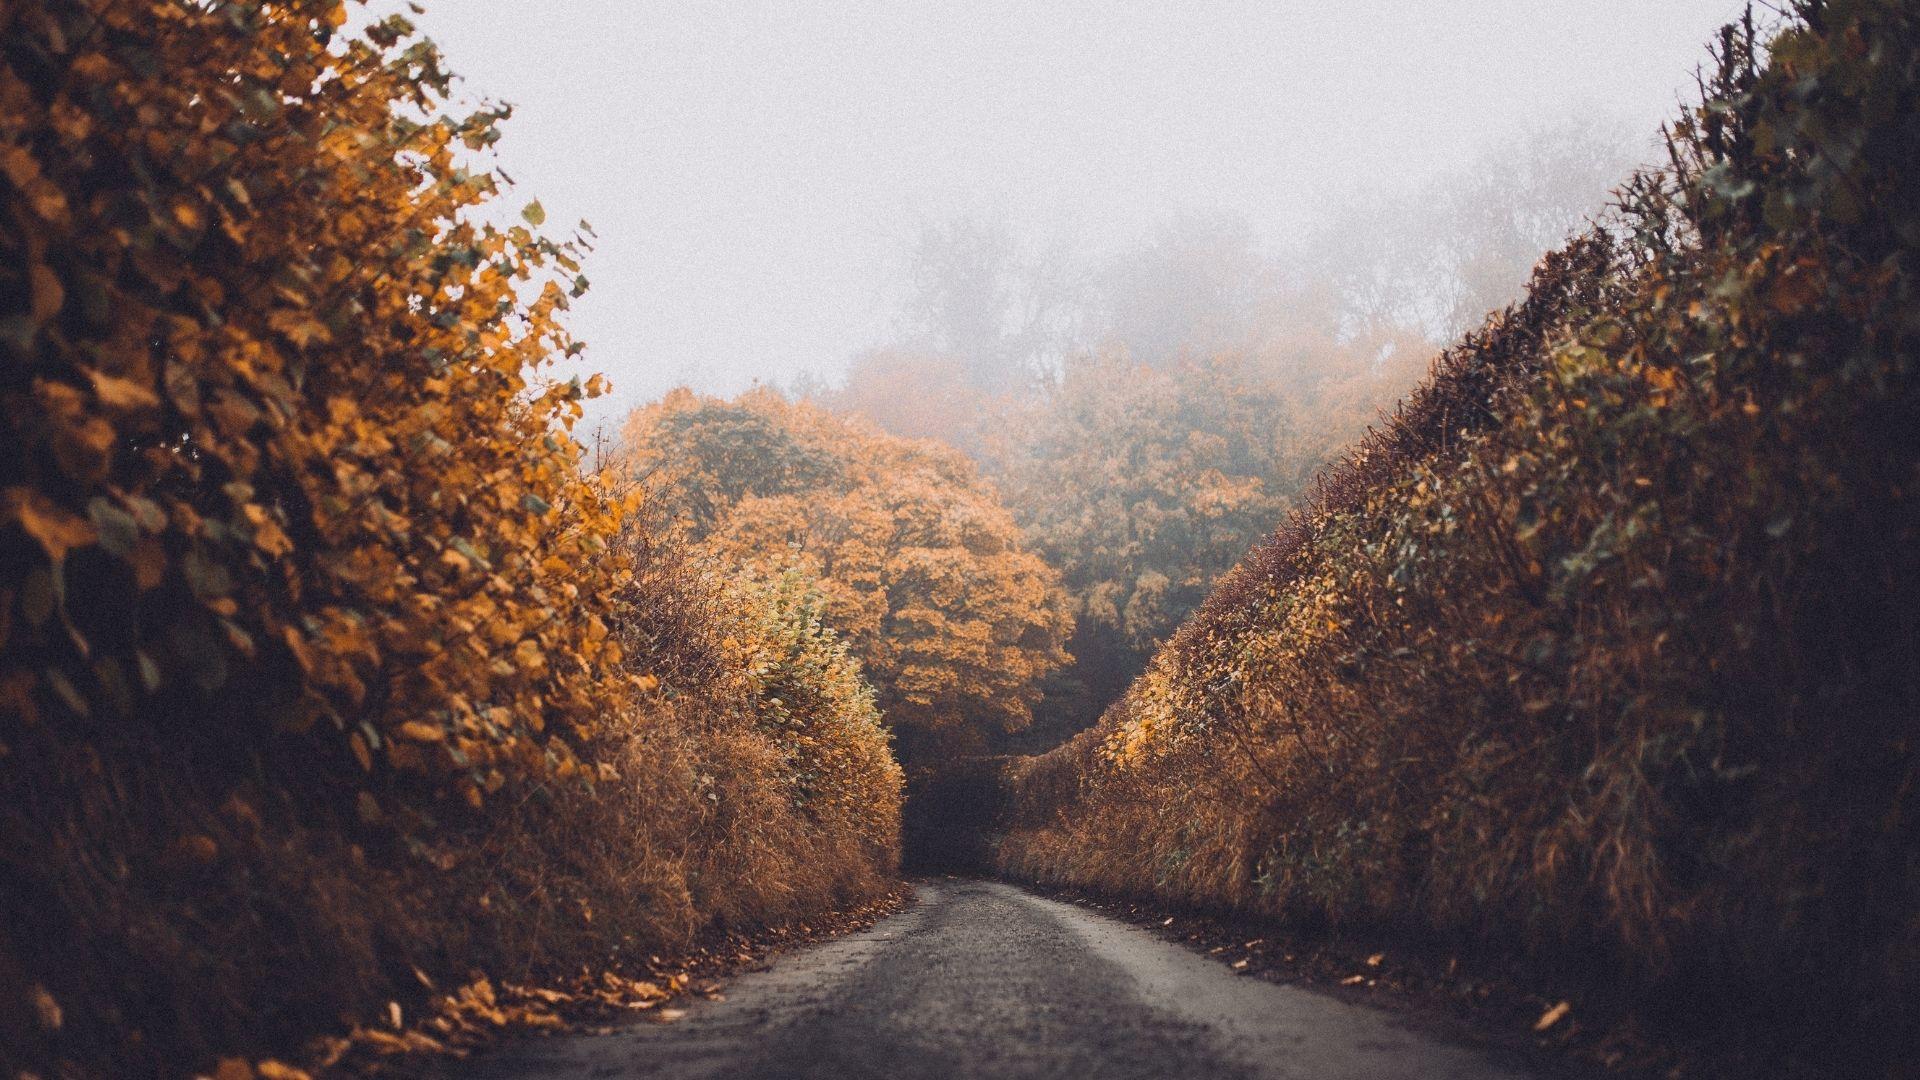 01 Herbstblues - ©www.canva.com